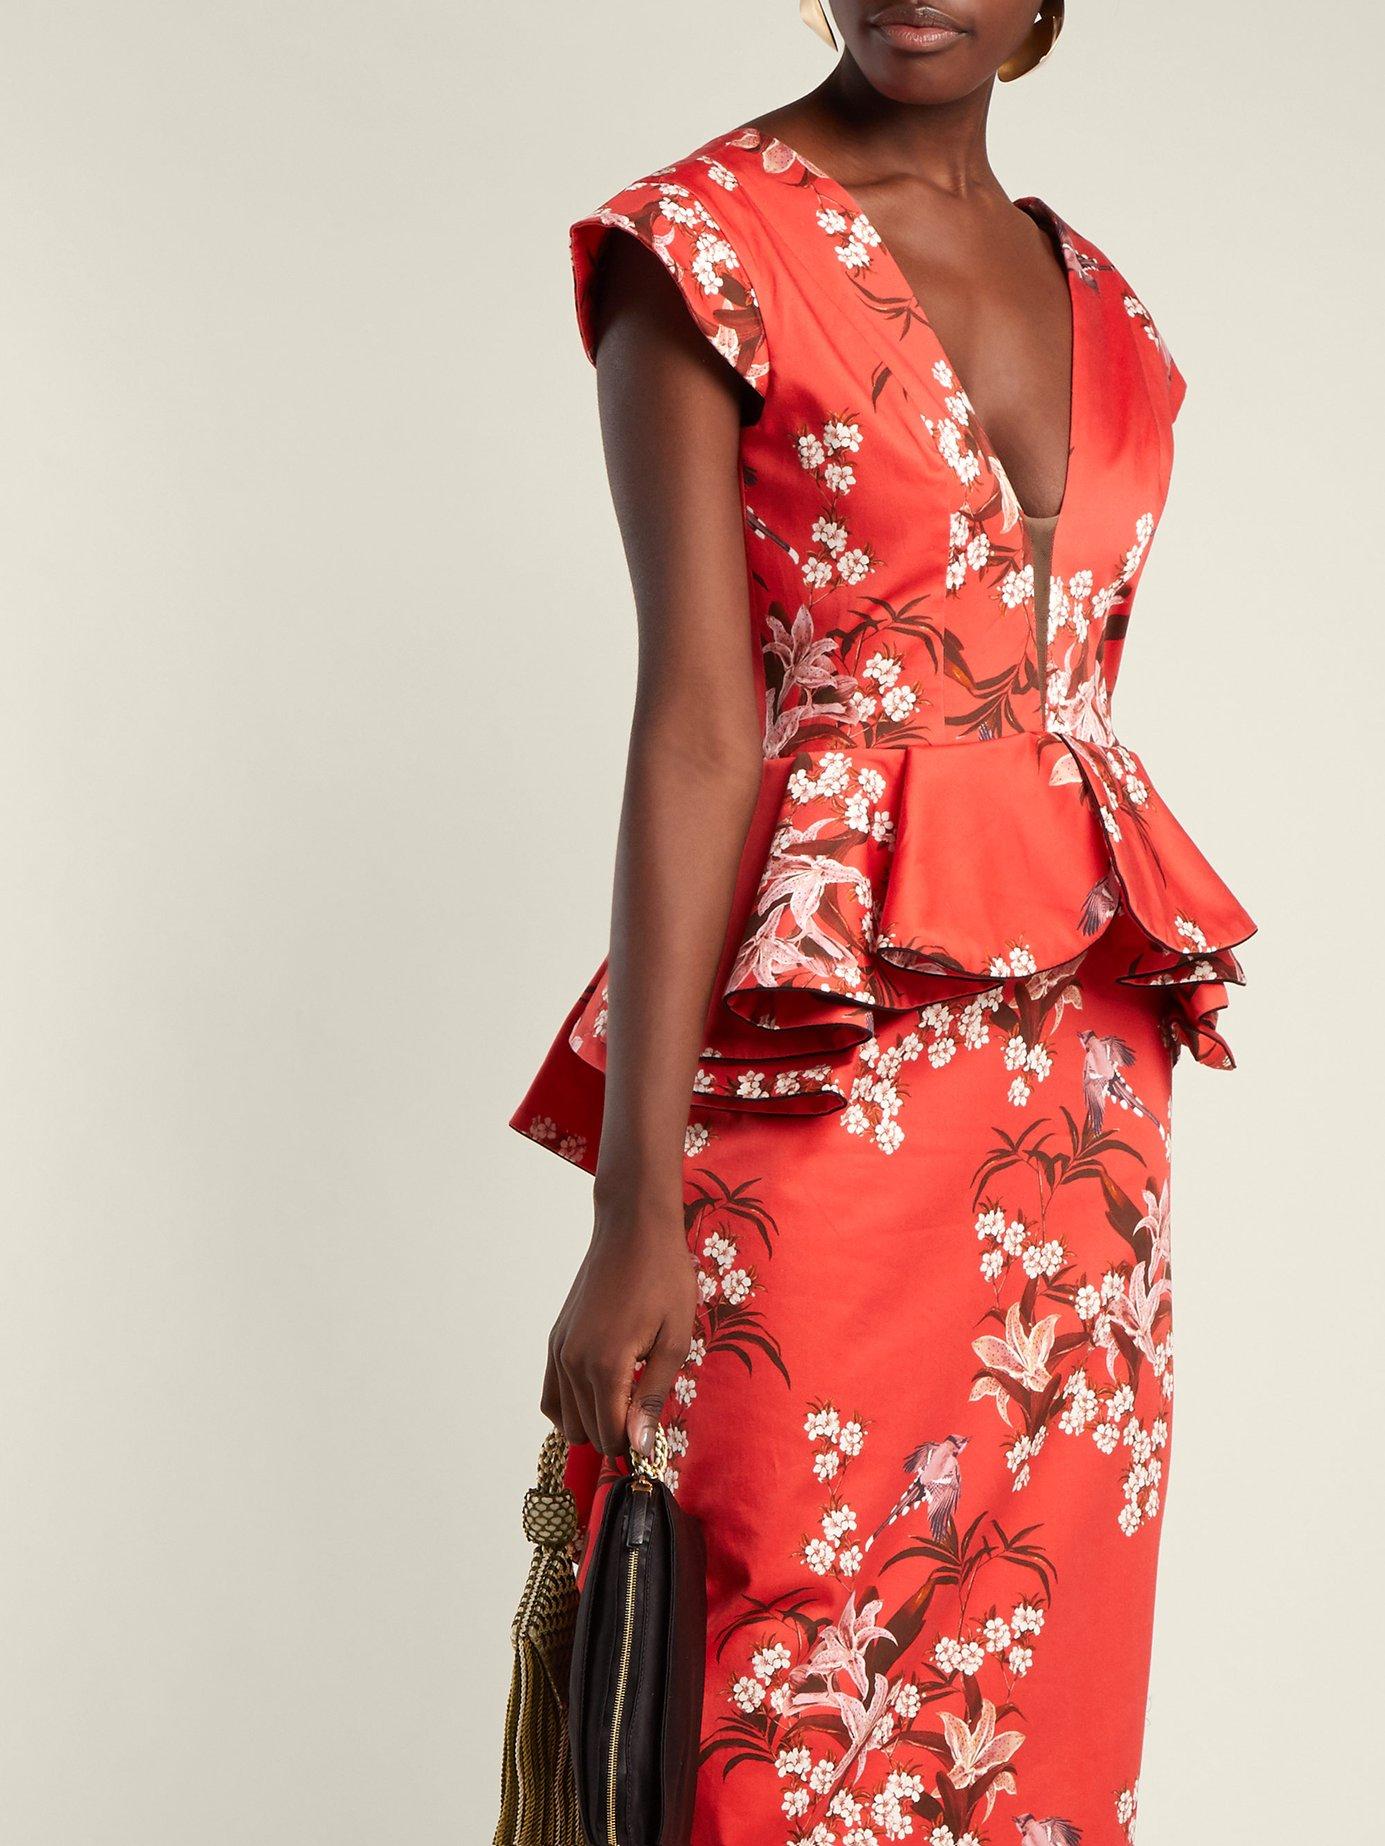 Florearse floral-print cotton-blend dress by Johanna Ortiz